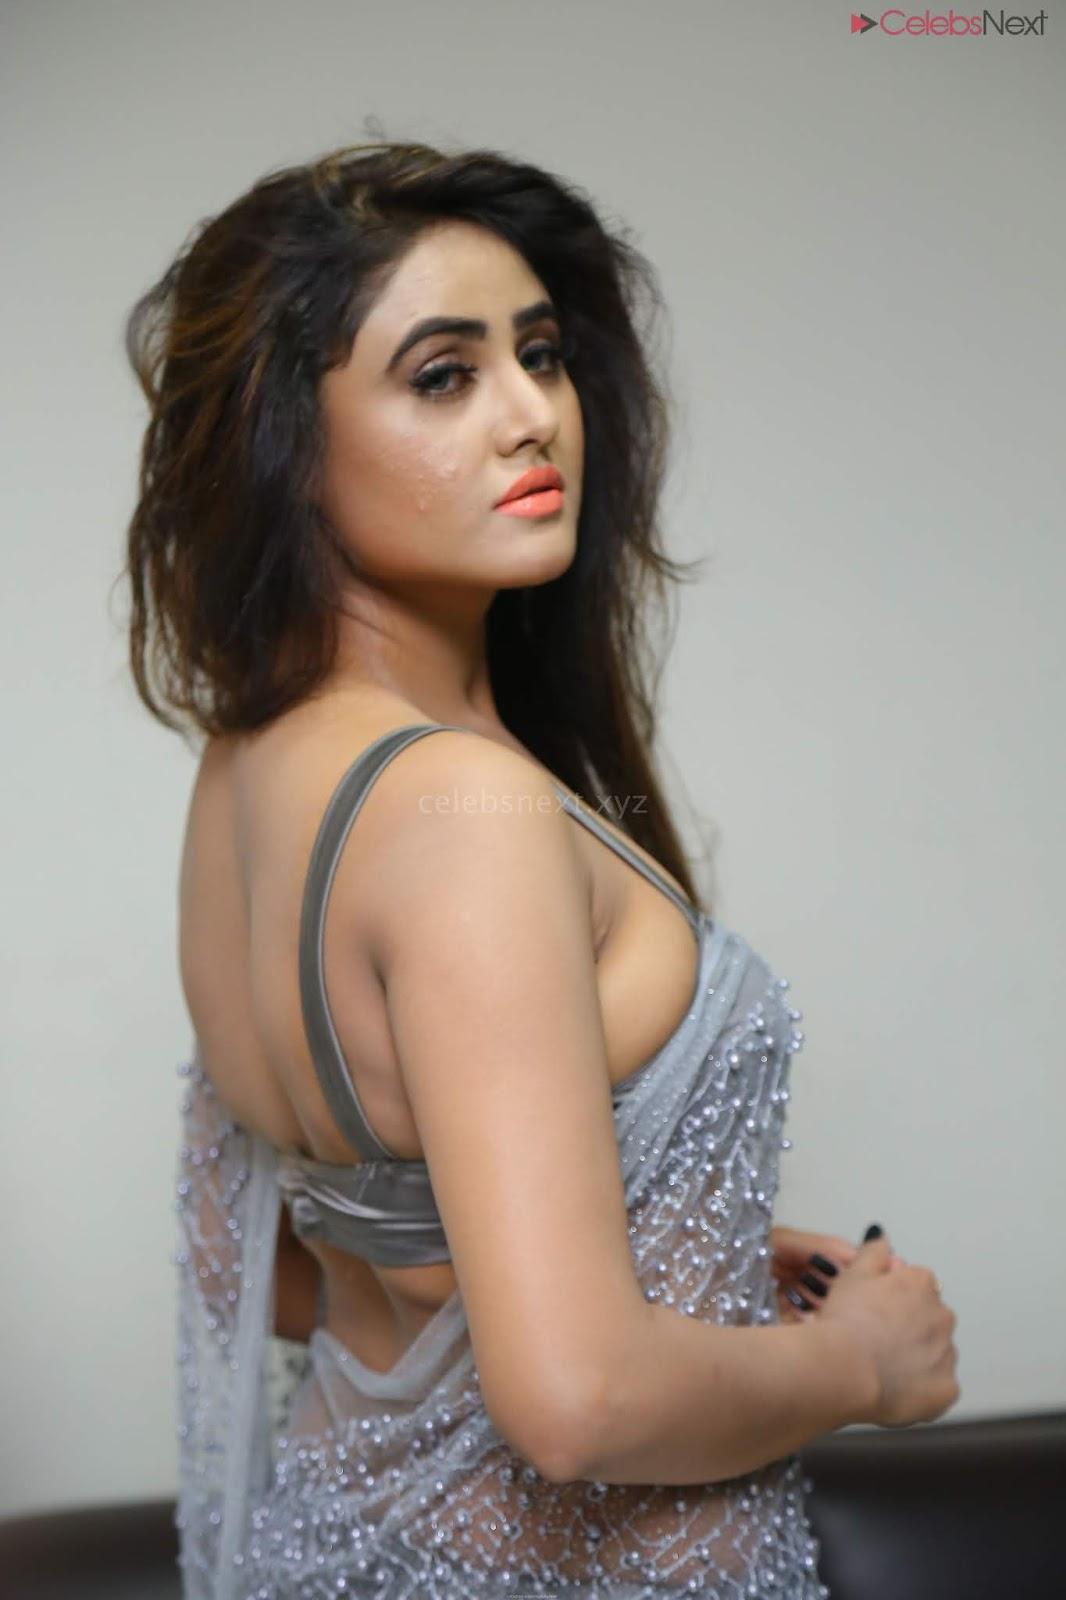 Sony Charishta in Saree and Brastyle choli CEleBsNext.XYZ Exclusive